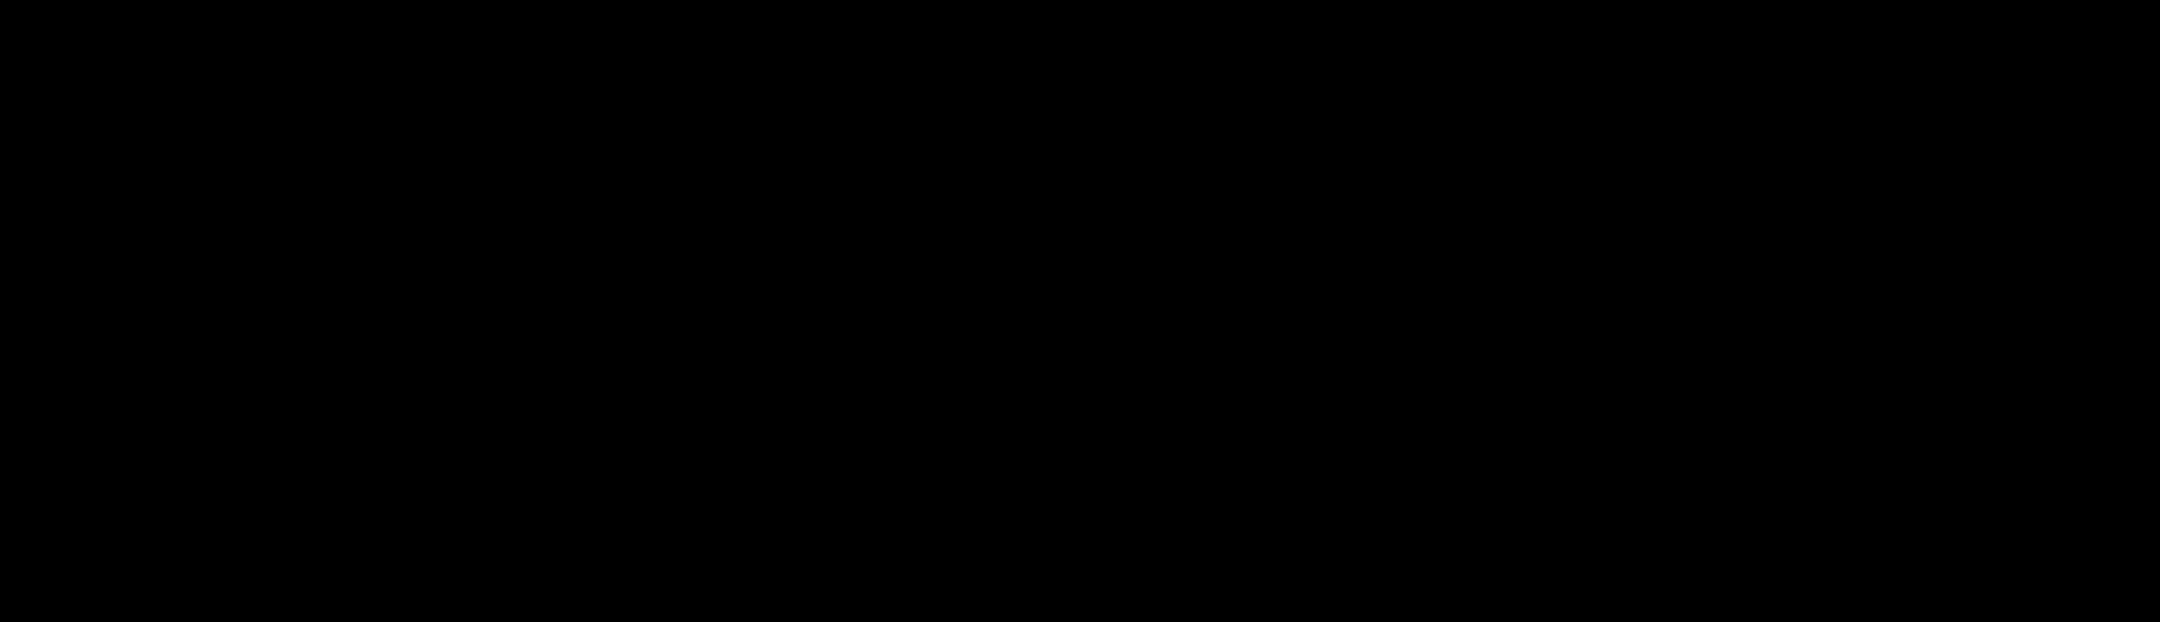 cbs logo 1 - CBS Logo